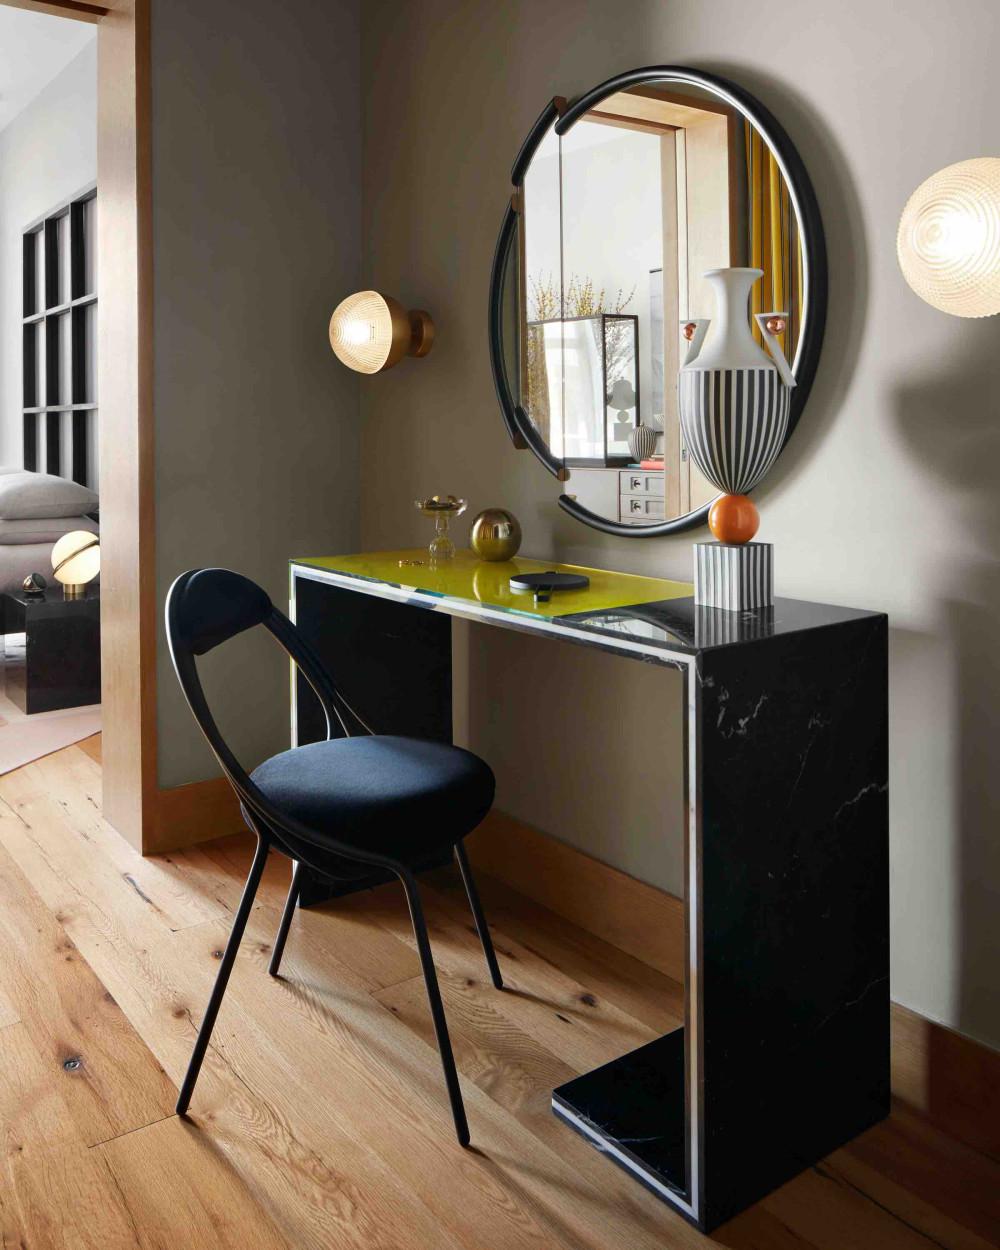 leebroom-living-room-skj-006.jpg